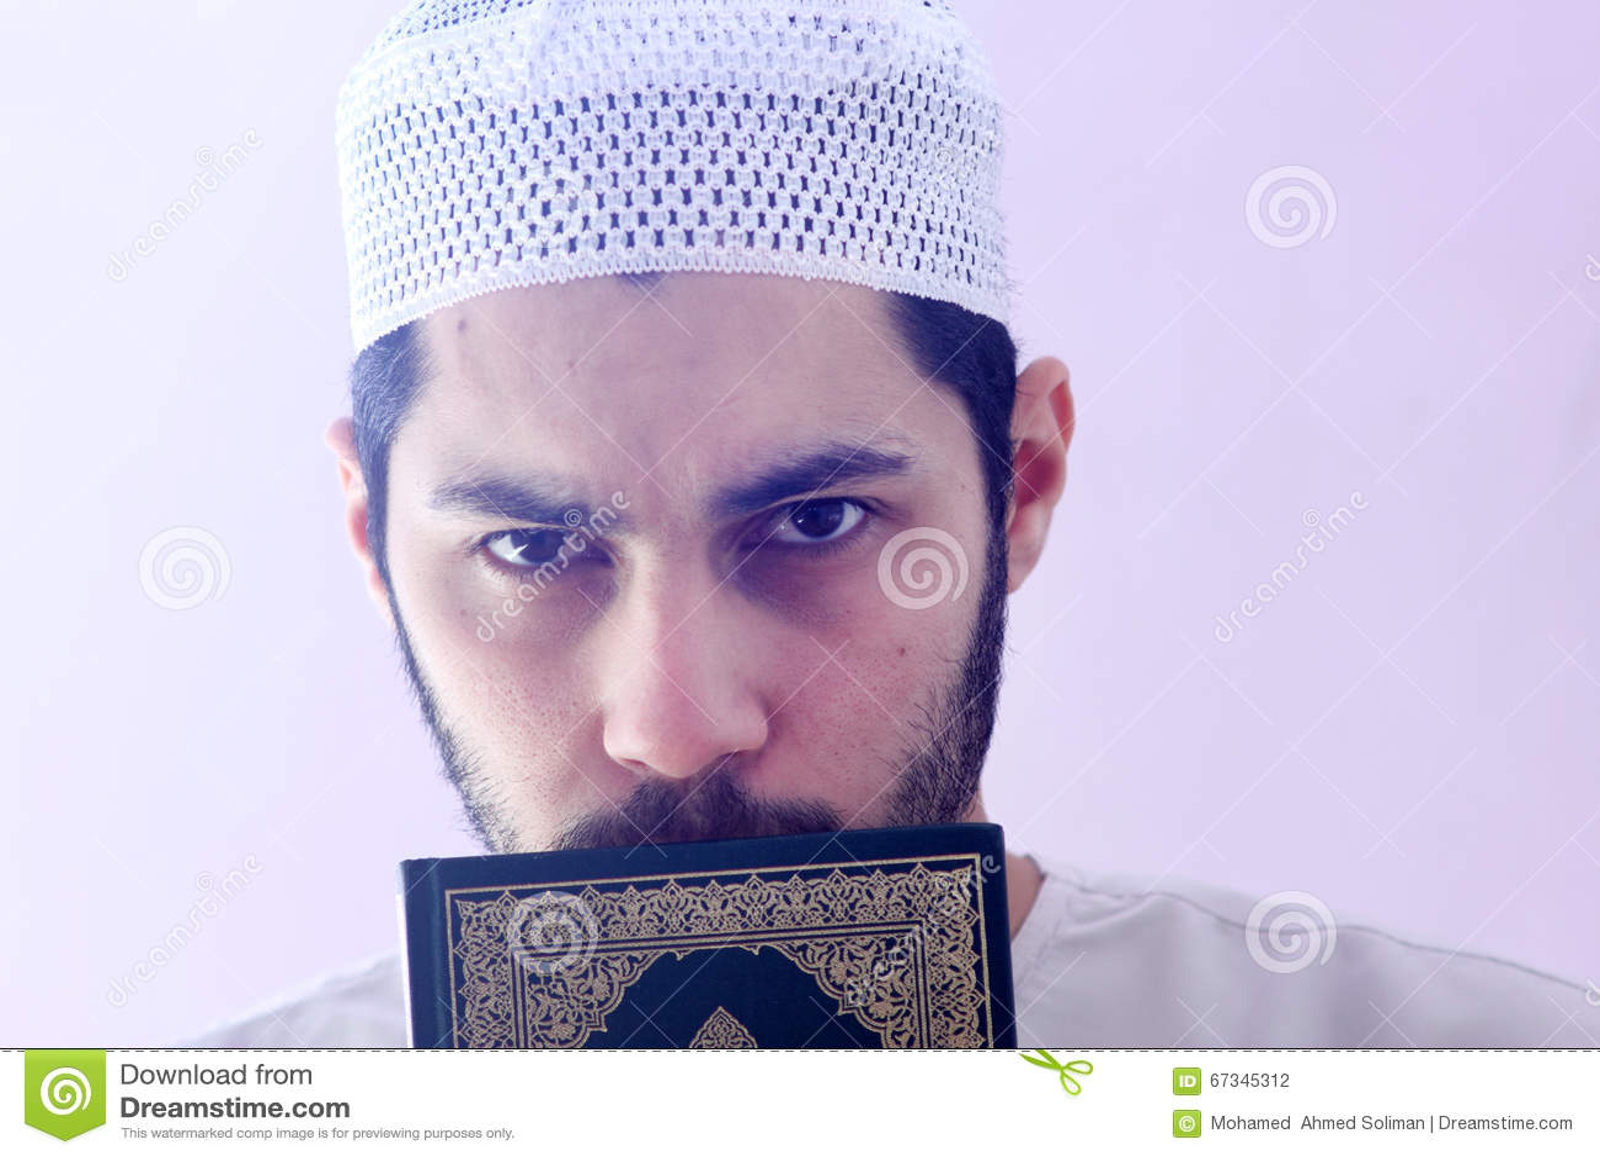 dating an egyptian muslim man